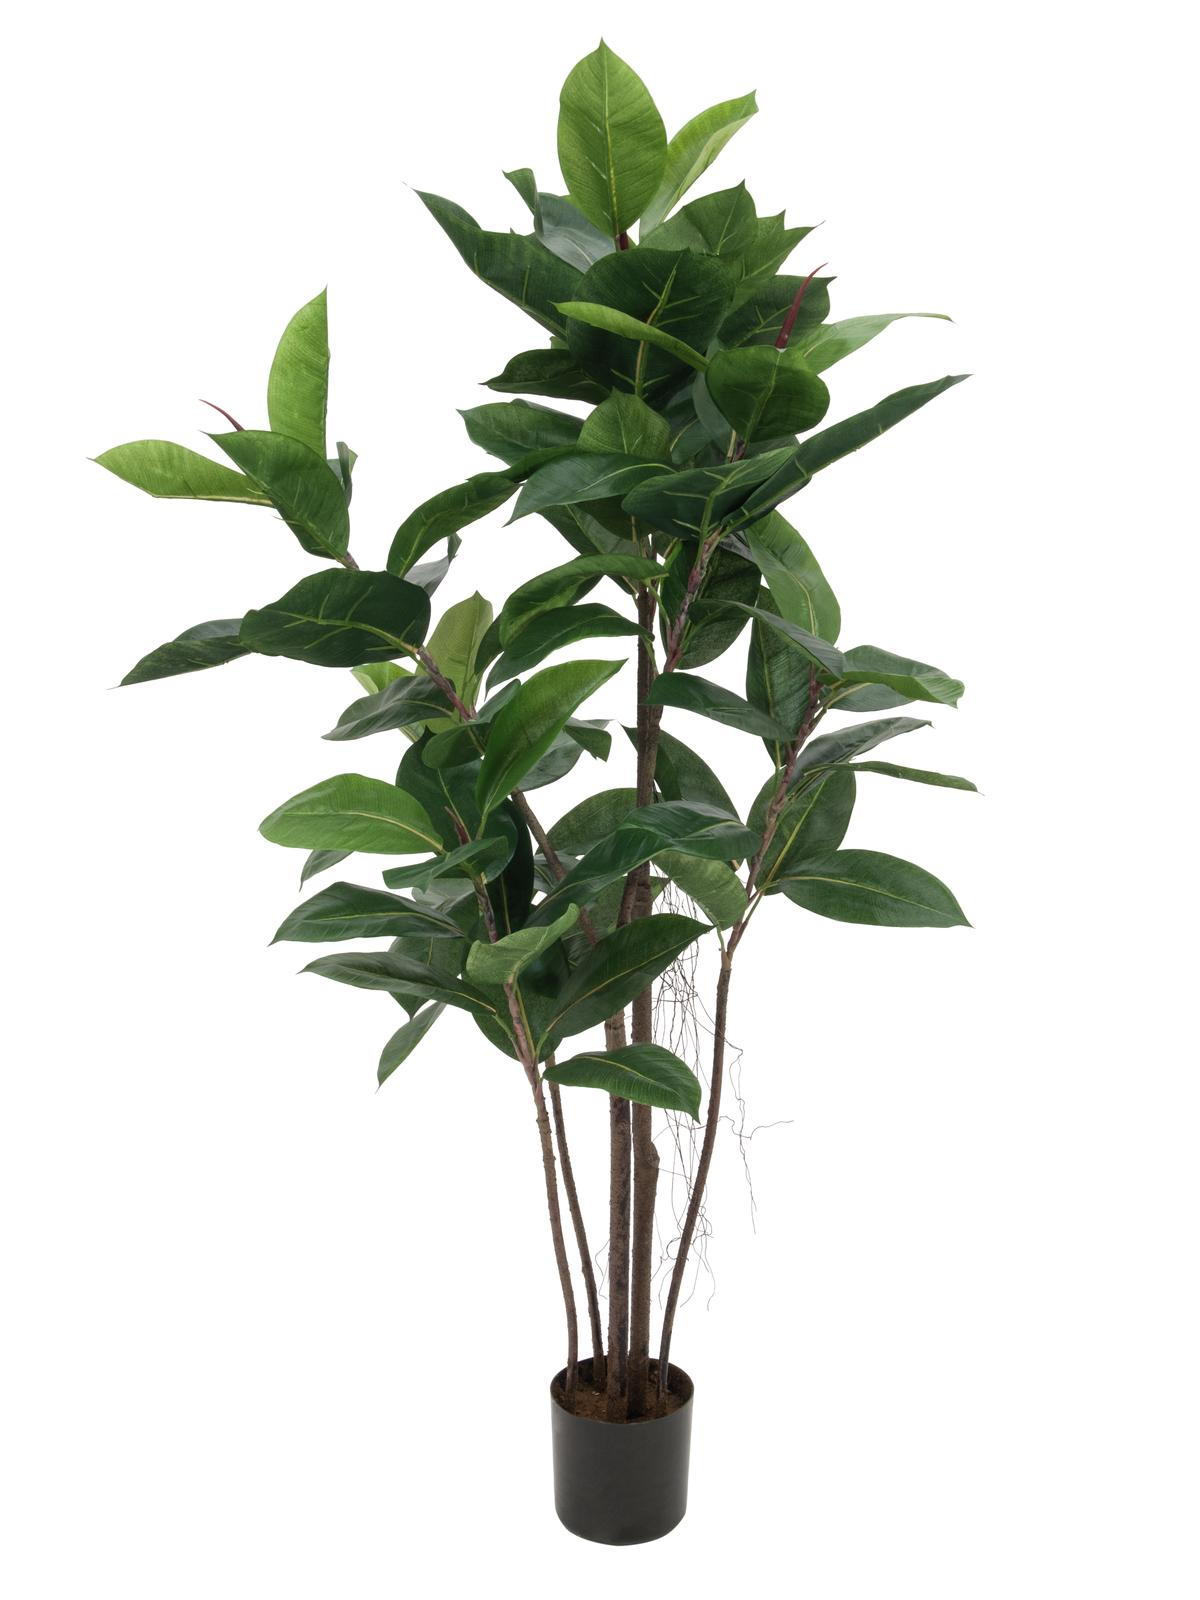 europalms-gummibaum-120cm-kunststoffpflanze